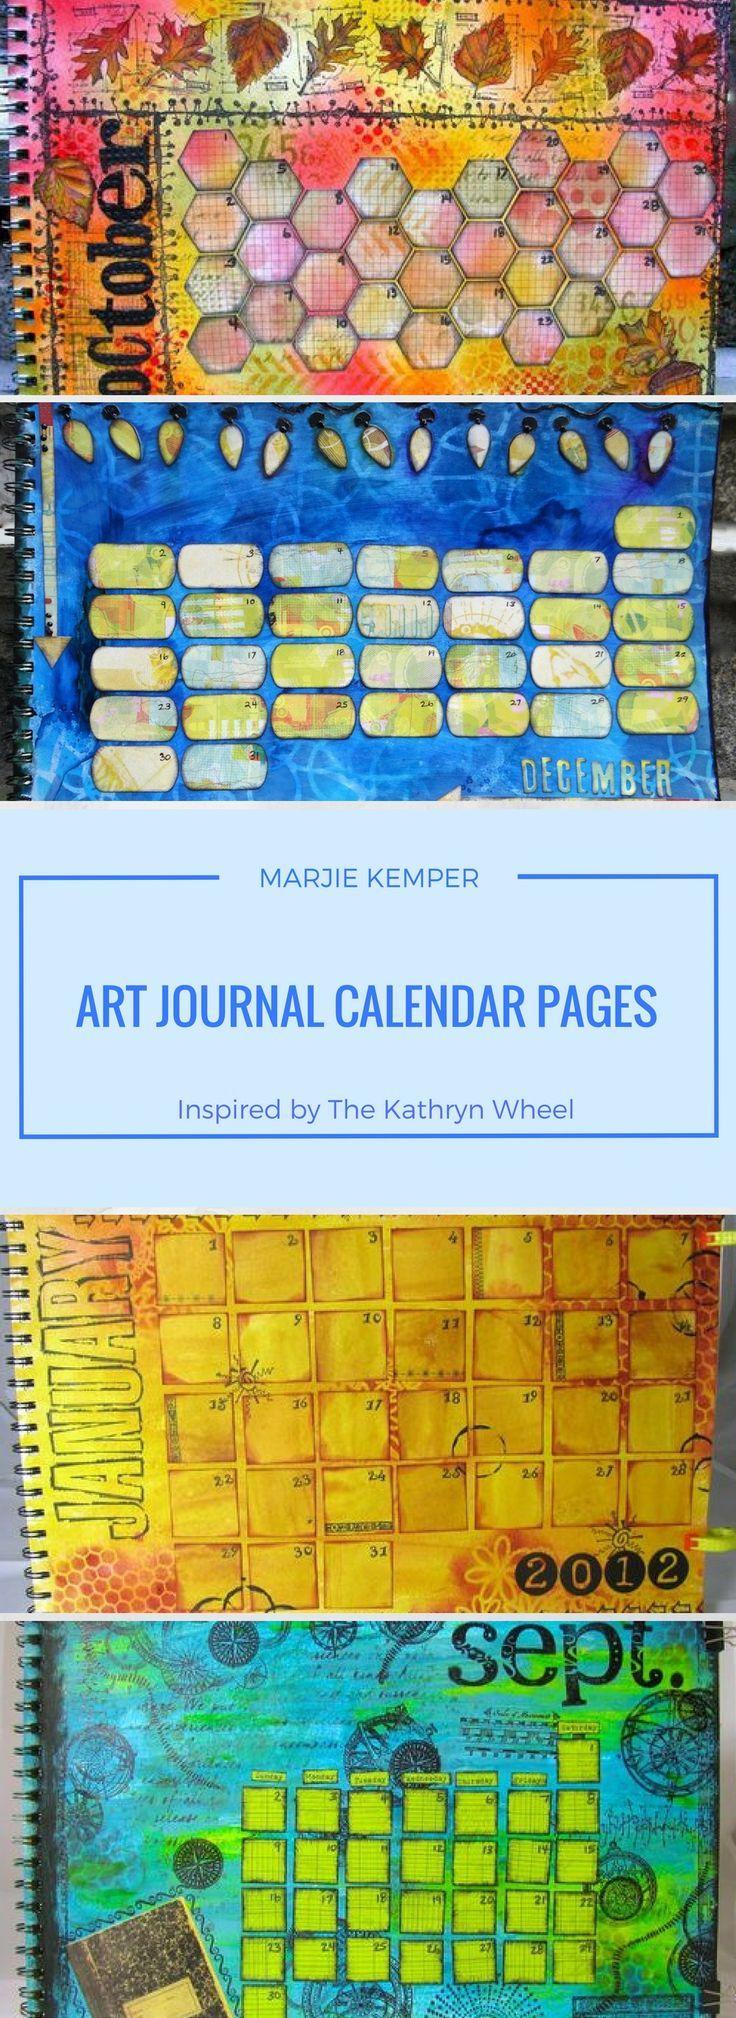 Art Journal Calendar Pages : Best images about art journal inspiration on pinterest